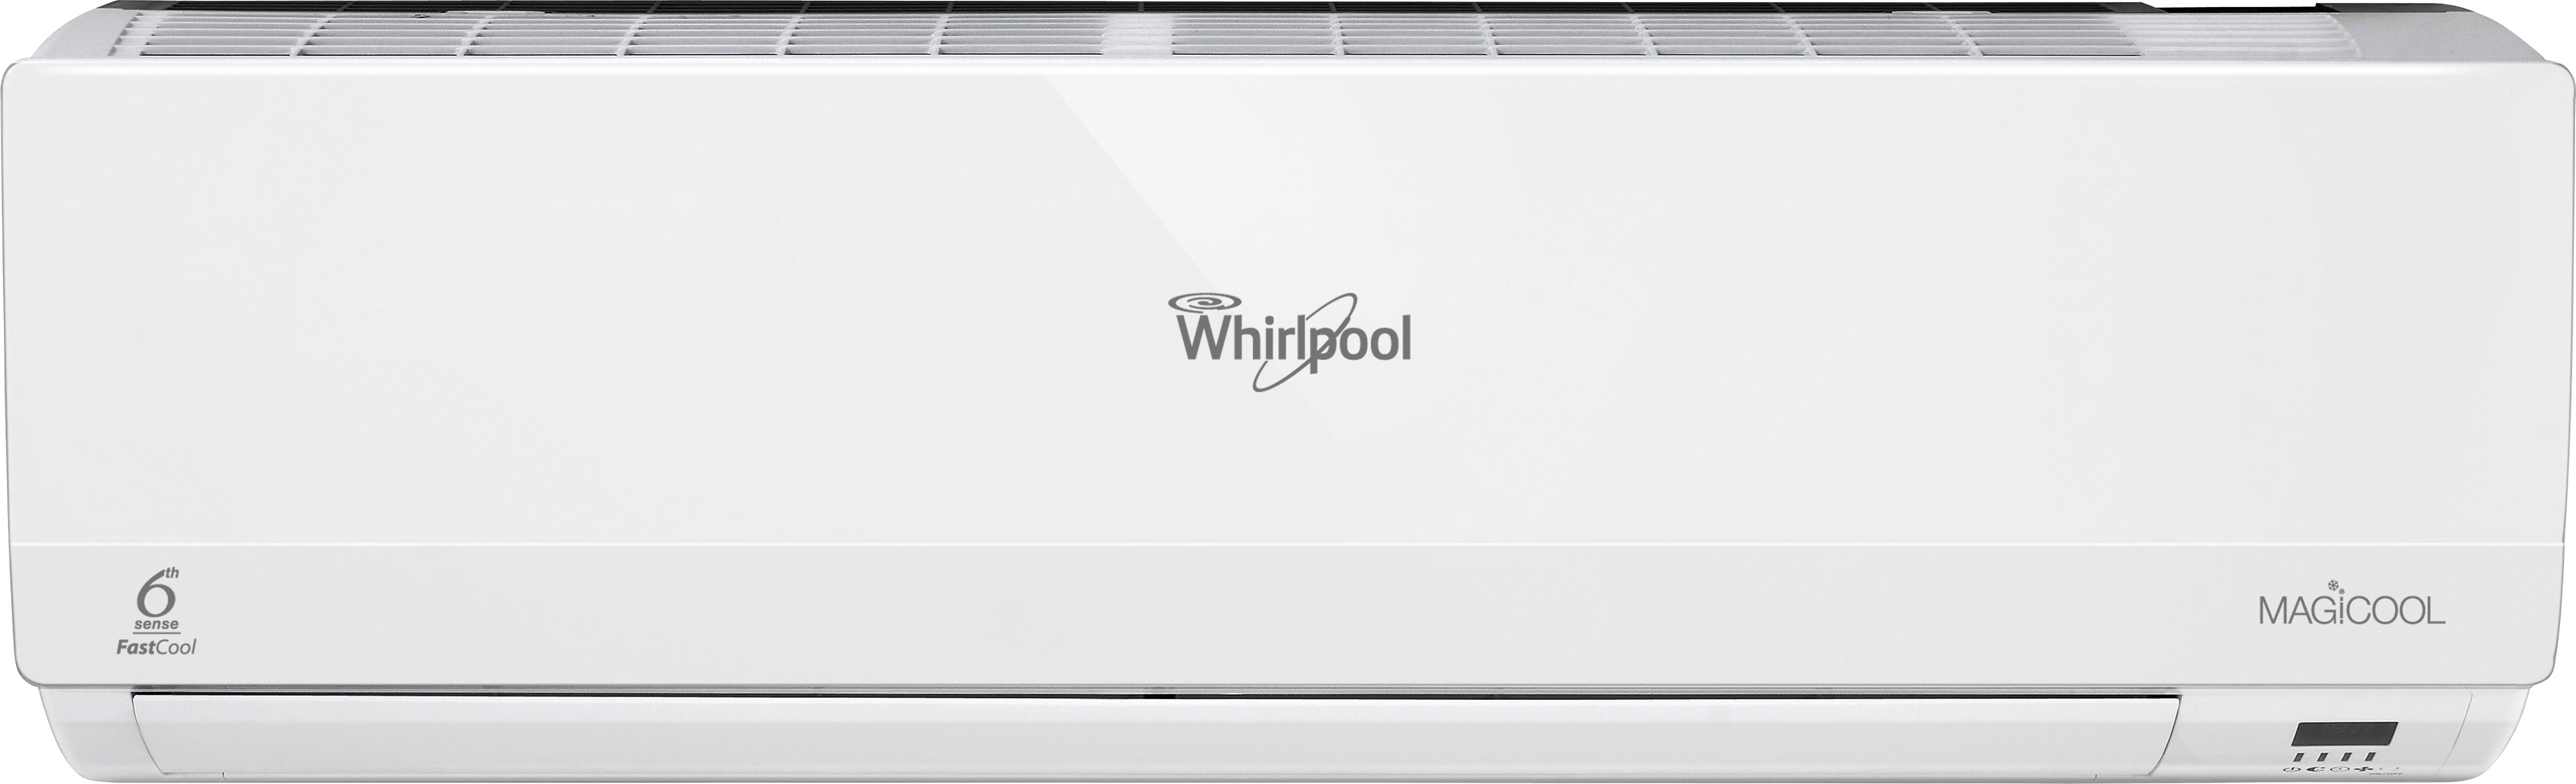 Whirlpool 1.5 Ton 3 Star Split AC White(1.5T MAGICOOL DLX COPR 3S ...